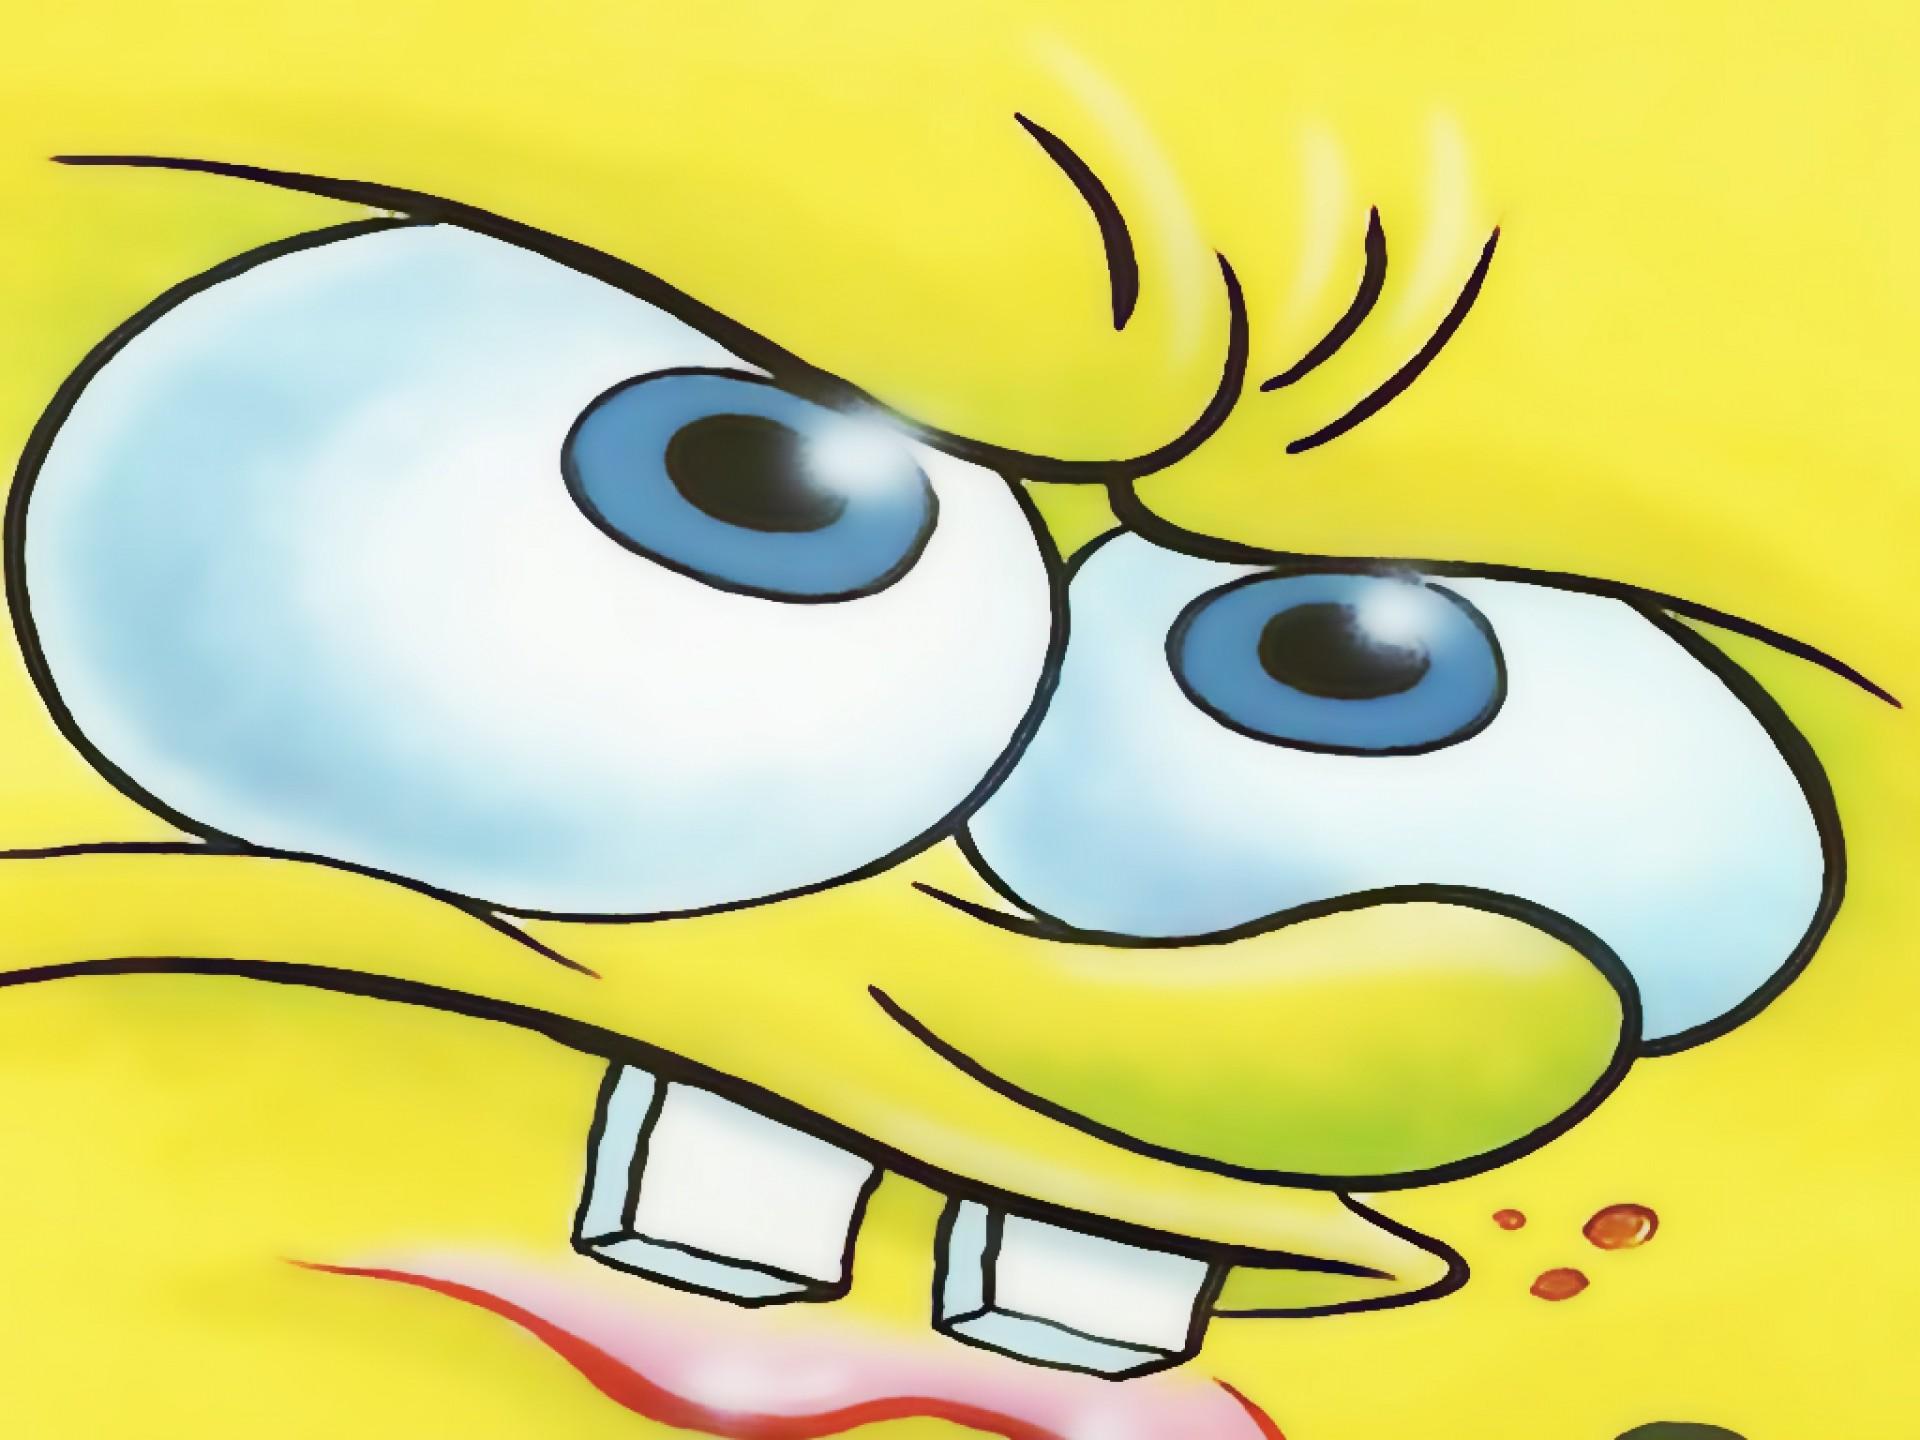 Background Spongebob Wallpapers HD Wallpapers HD Wallpapers 1920x1440